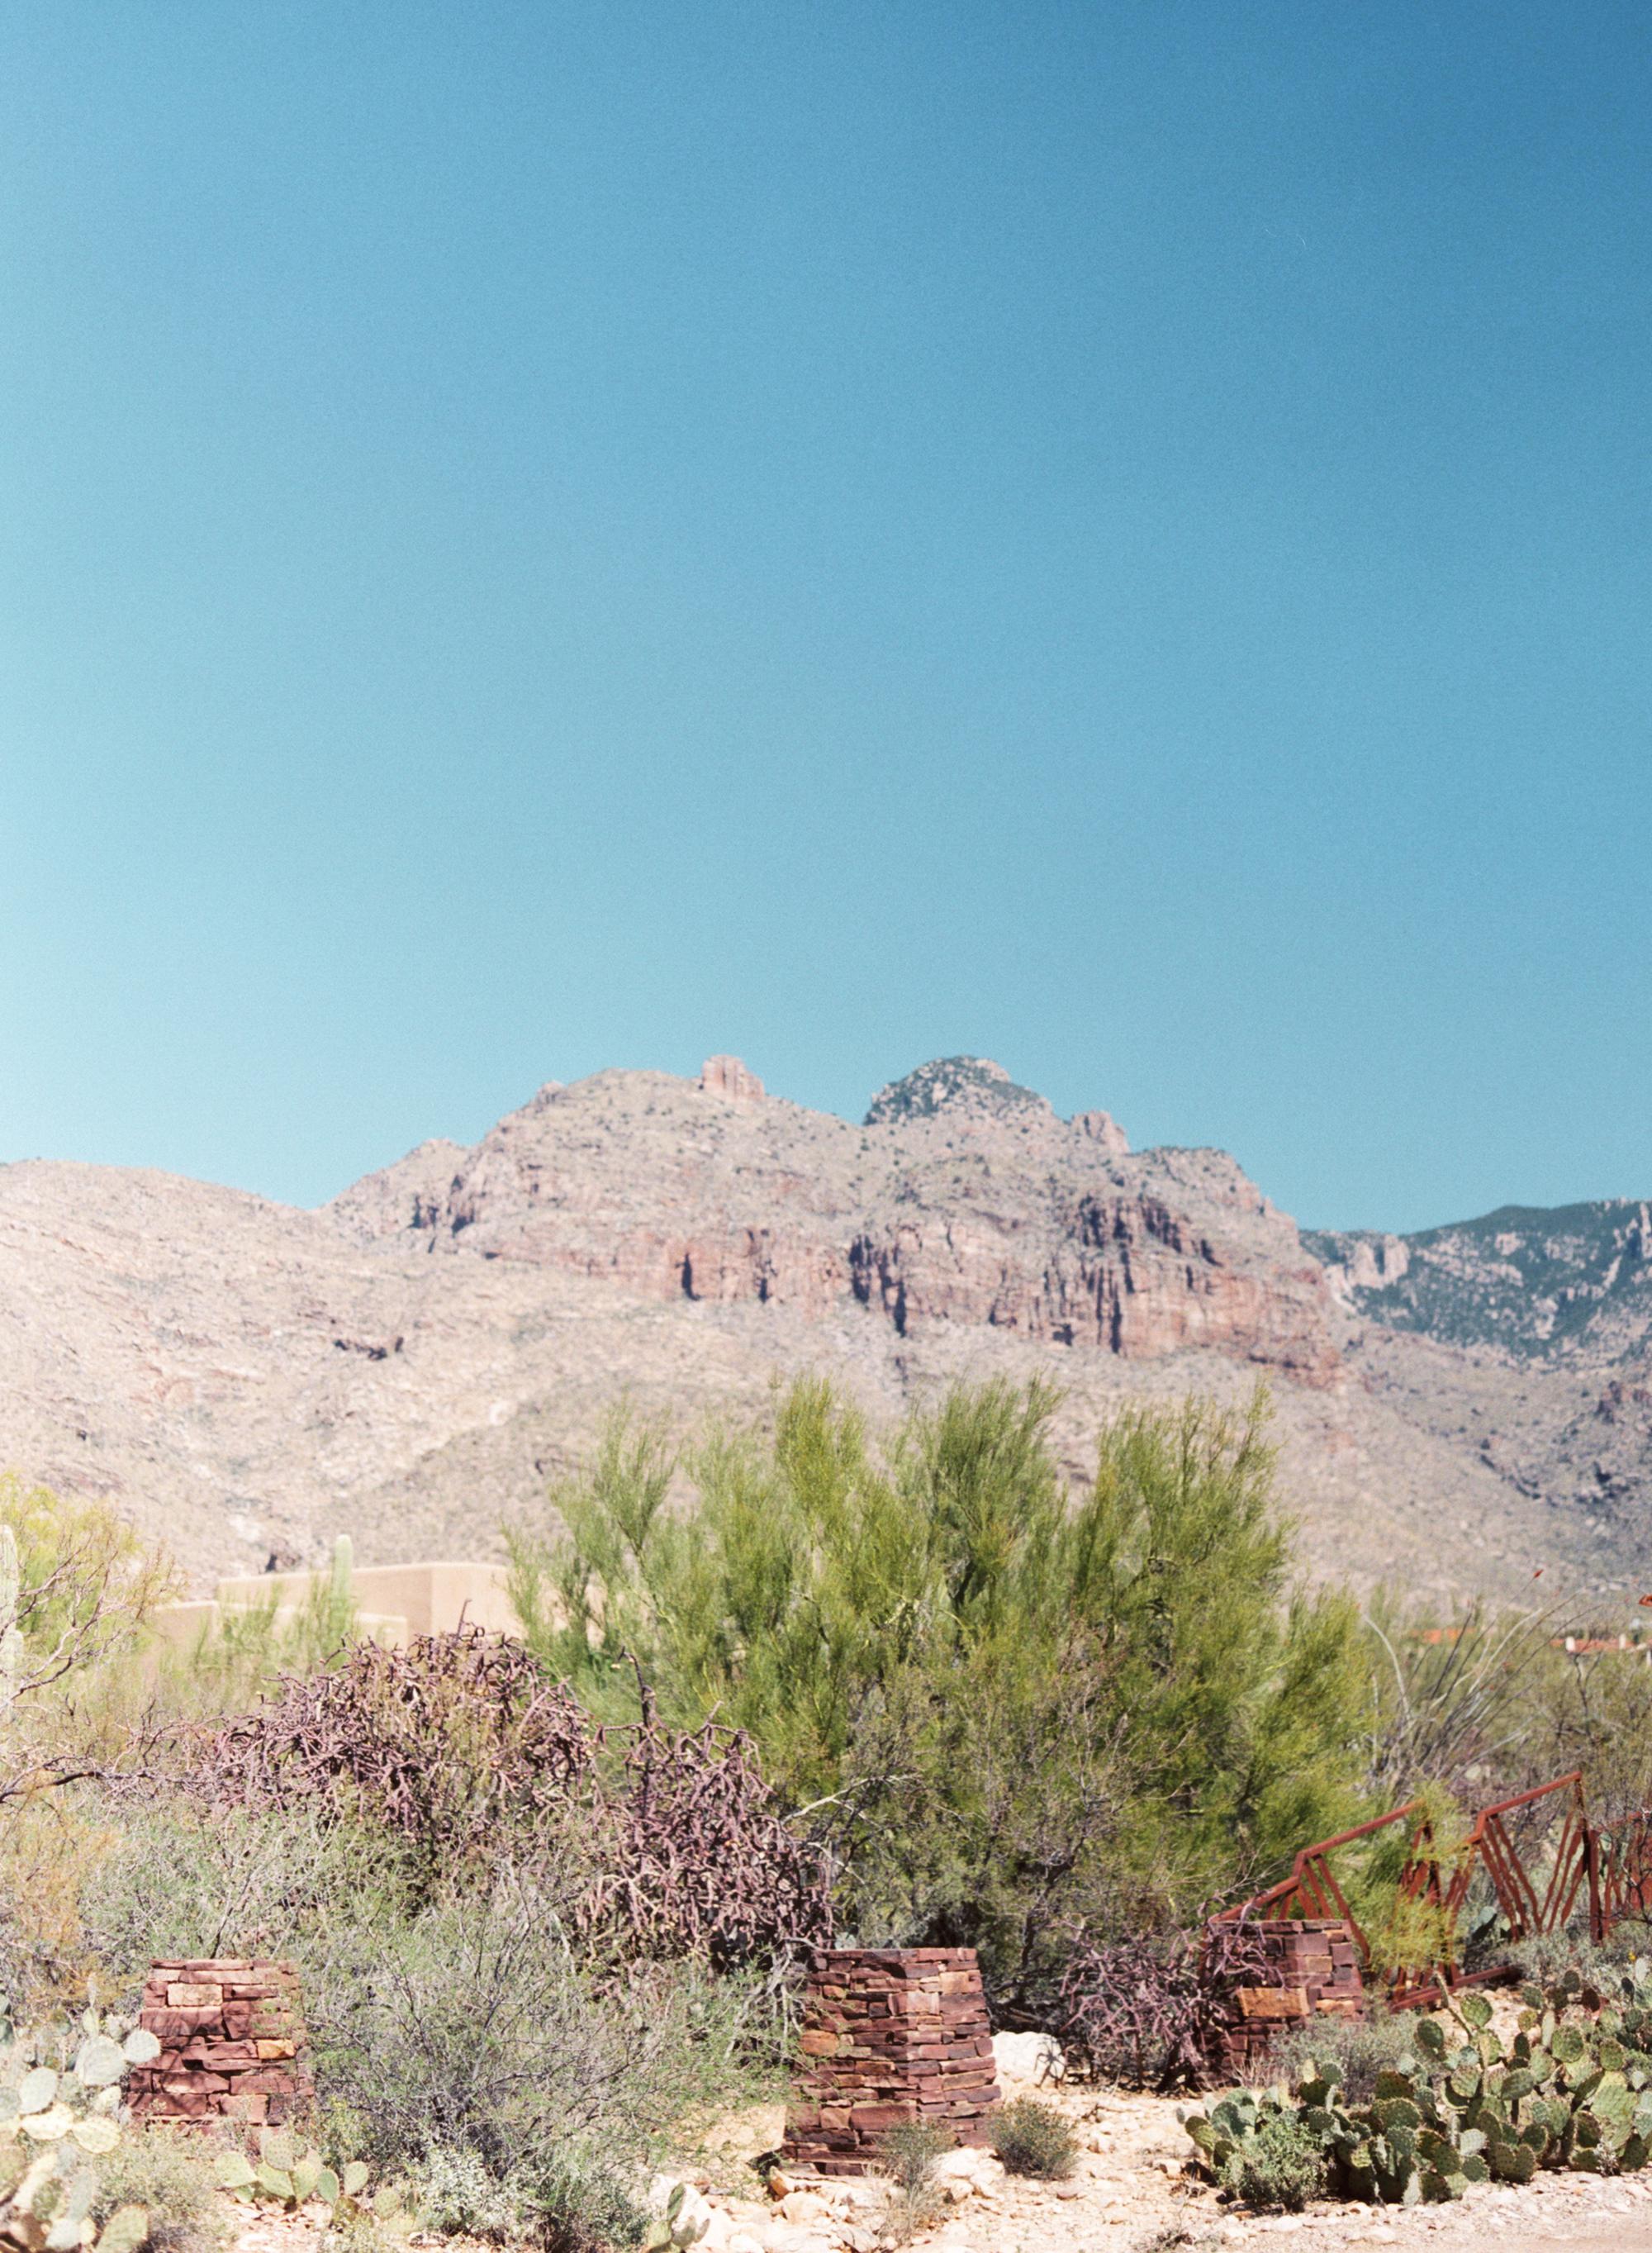 Catalina Foothills mountain views